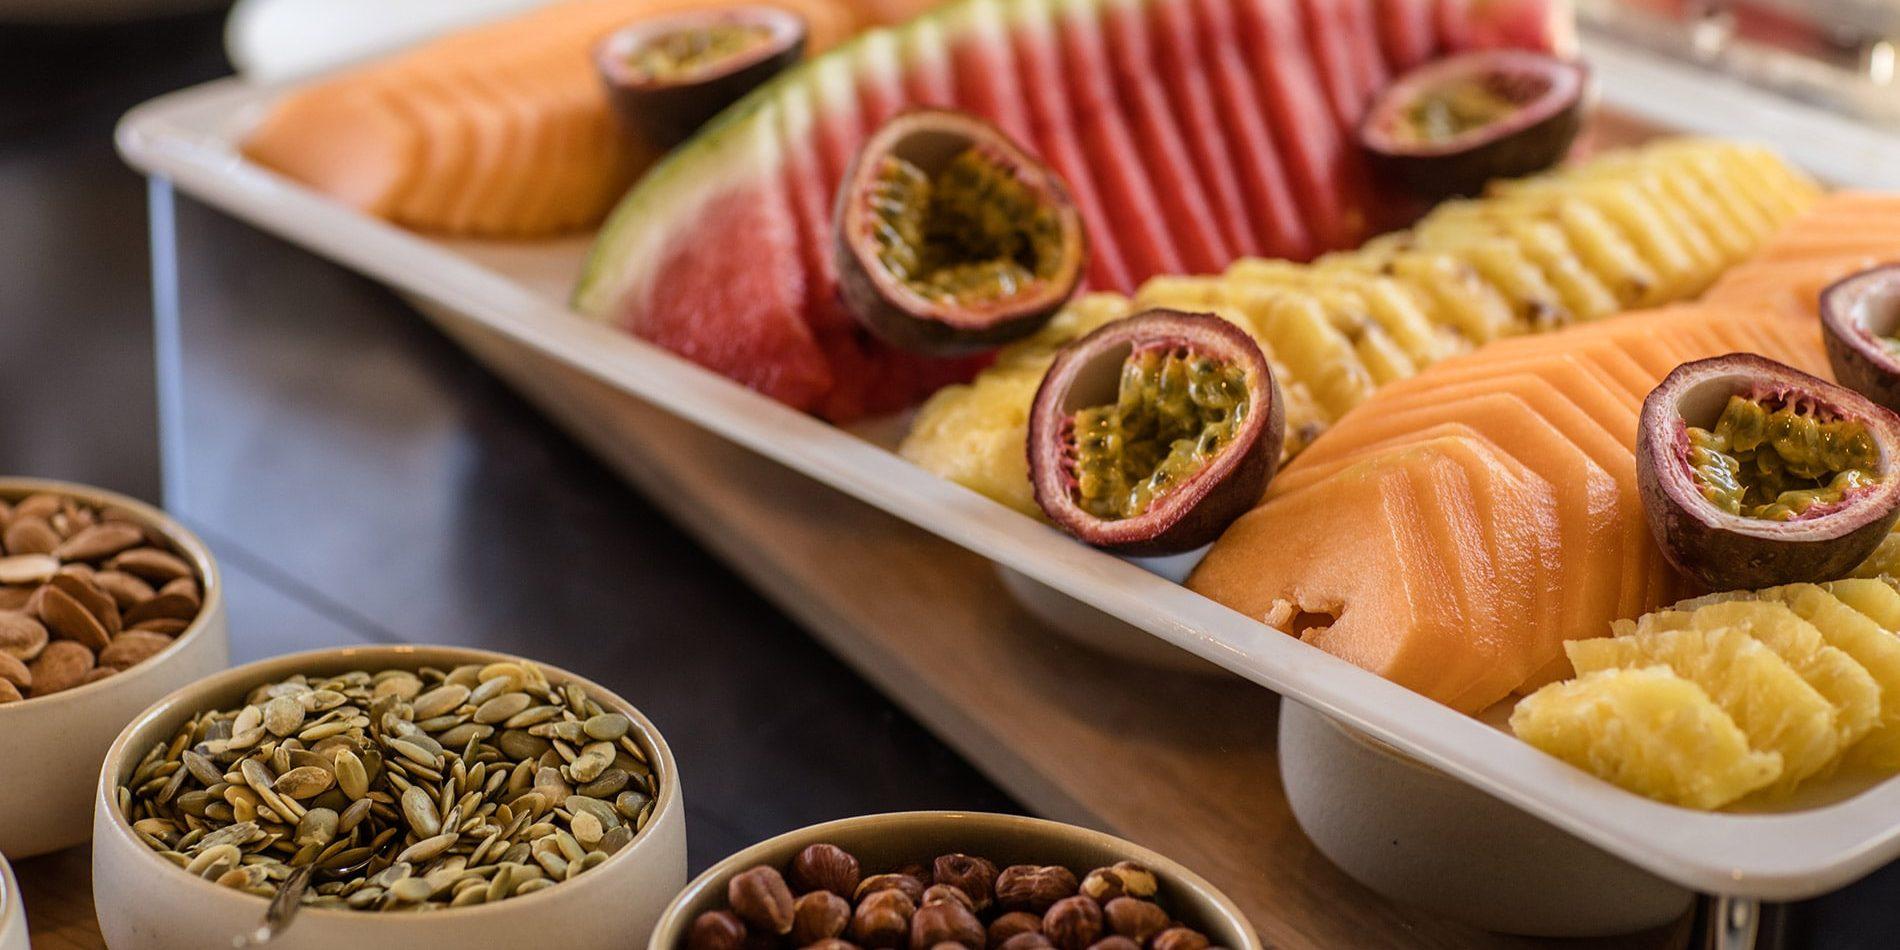 Hotel Misincu Cagnano Cap Corse Corsica Frankrijk ontbijt fruit noten zaden